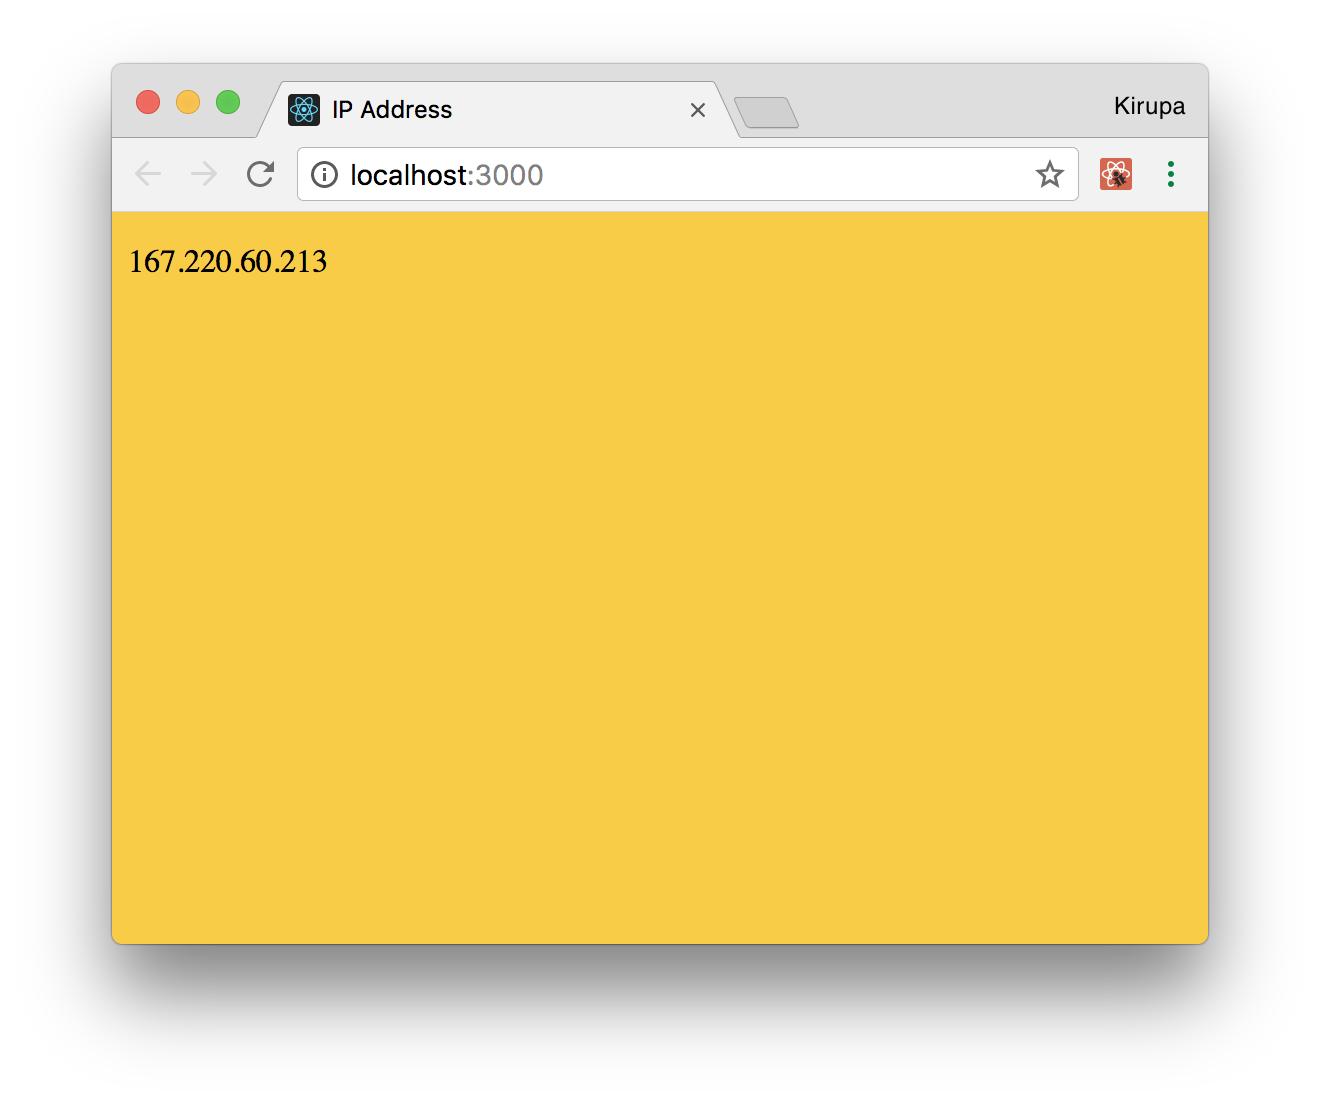 Working with External Data in React | kirupa com